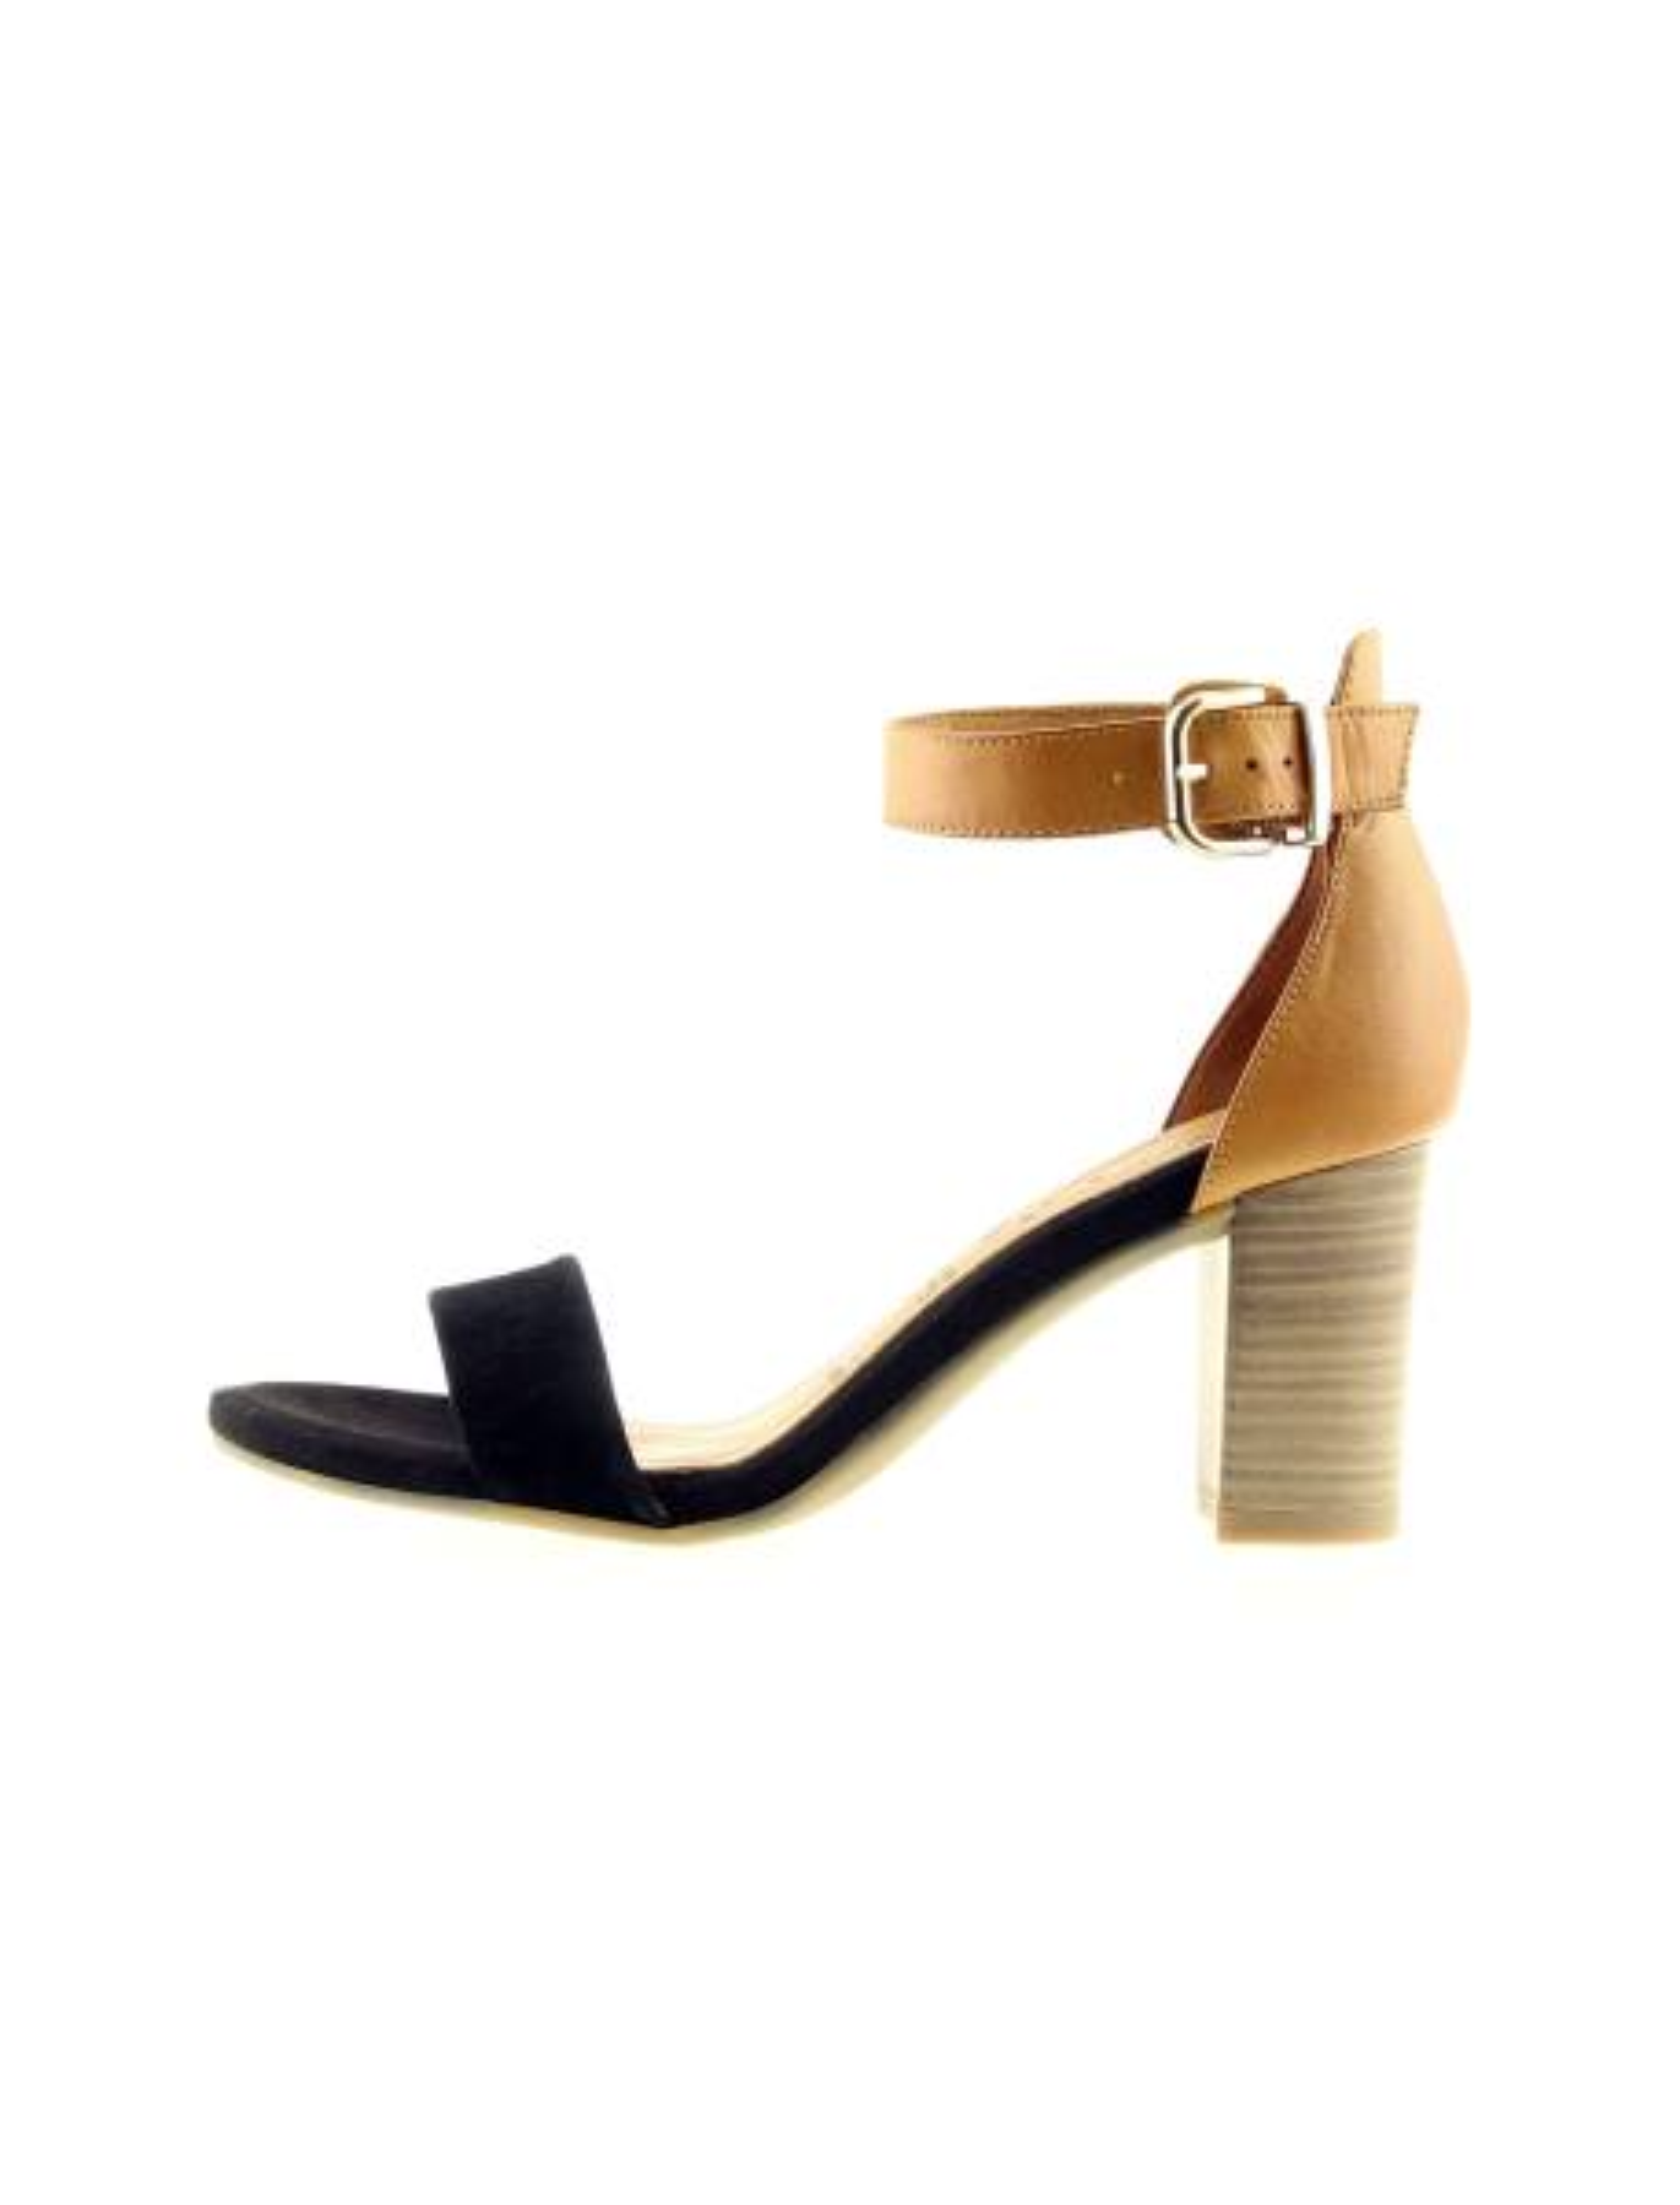 کفش پاشنه بلند چرم زنانه - مشکي و عسلي - 3